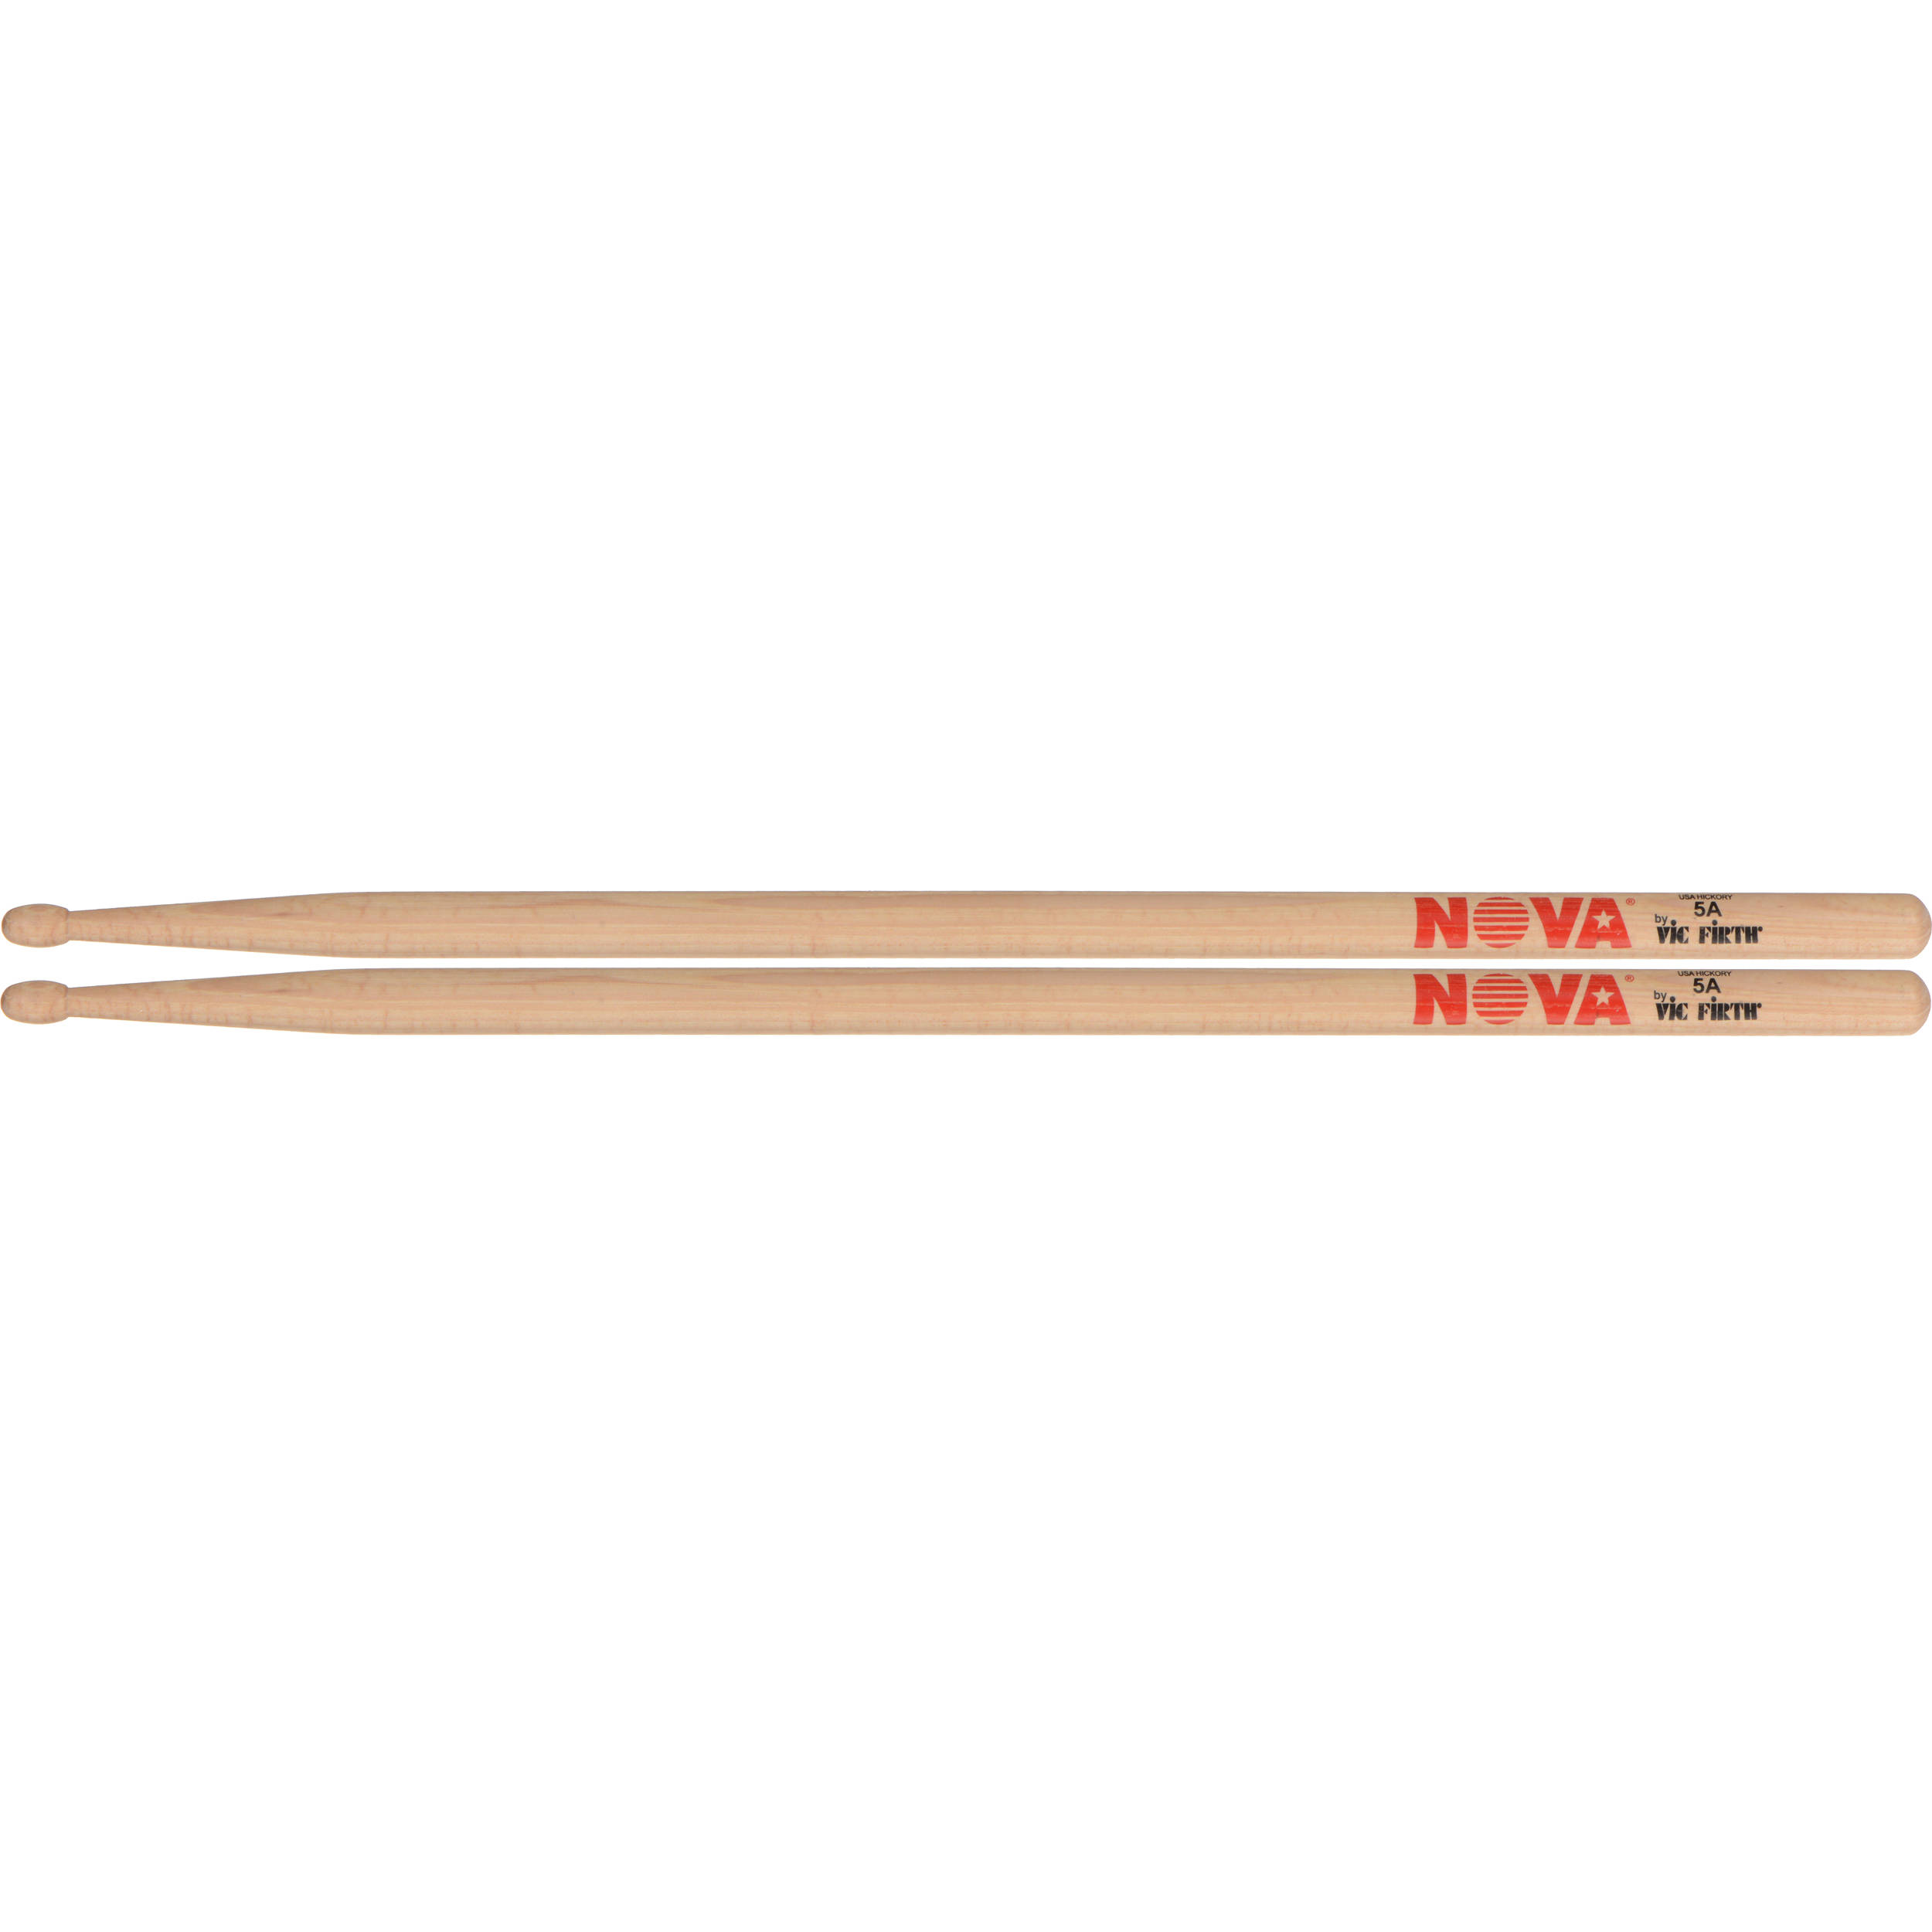 Nylon Tip, 1 Pair Vic Firth 5A Nova Drum Sticks